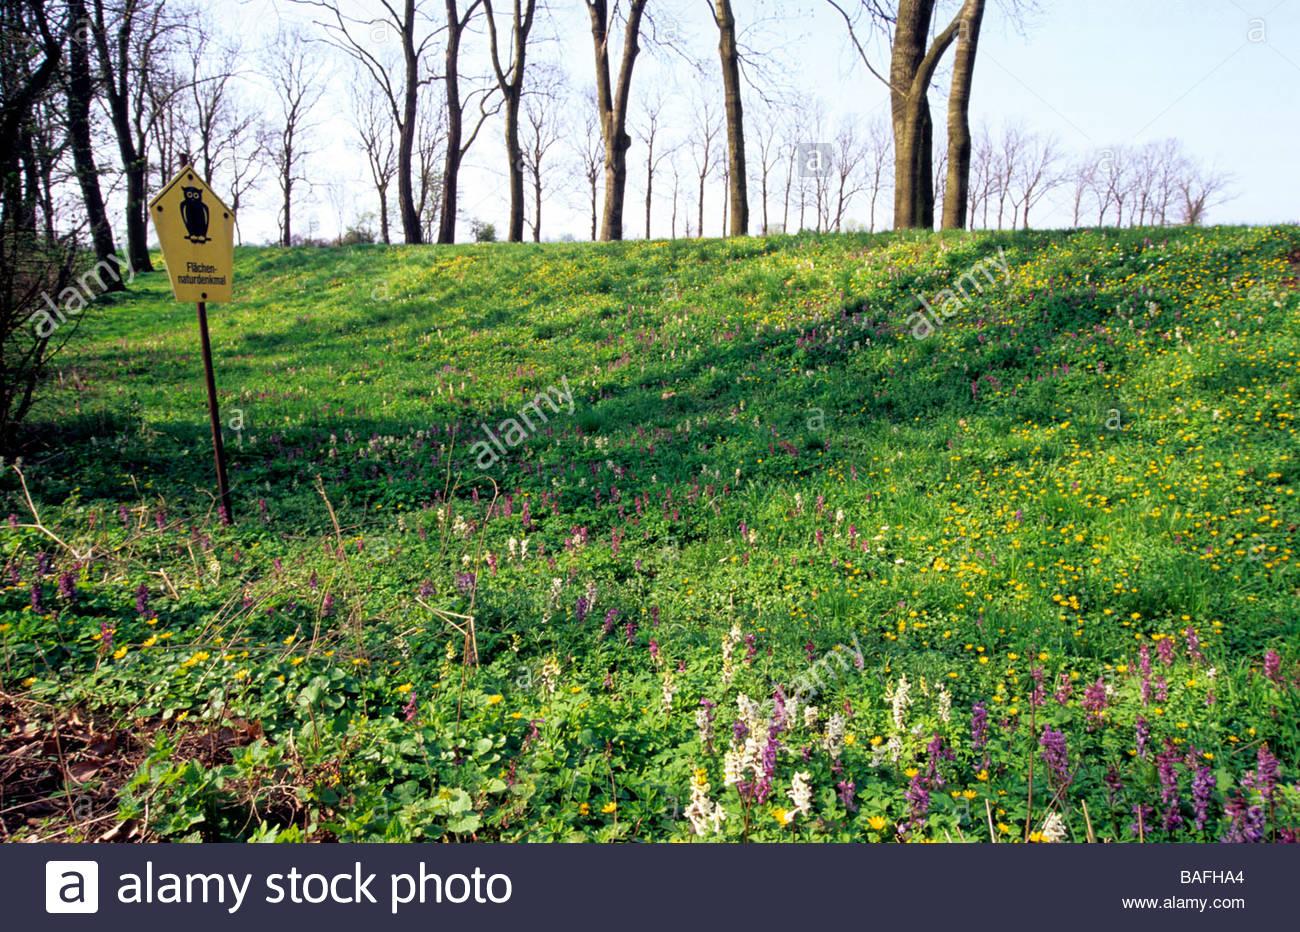 Flowering corydalis in nature reserve near Torgau Germany Blühender Lerchensporn in Flächennaturdenkmal nähe Torgau Stock Photo